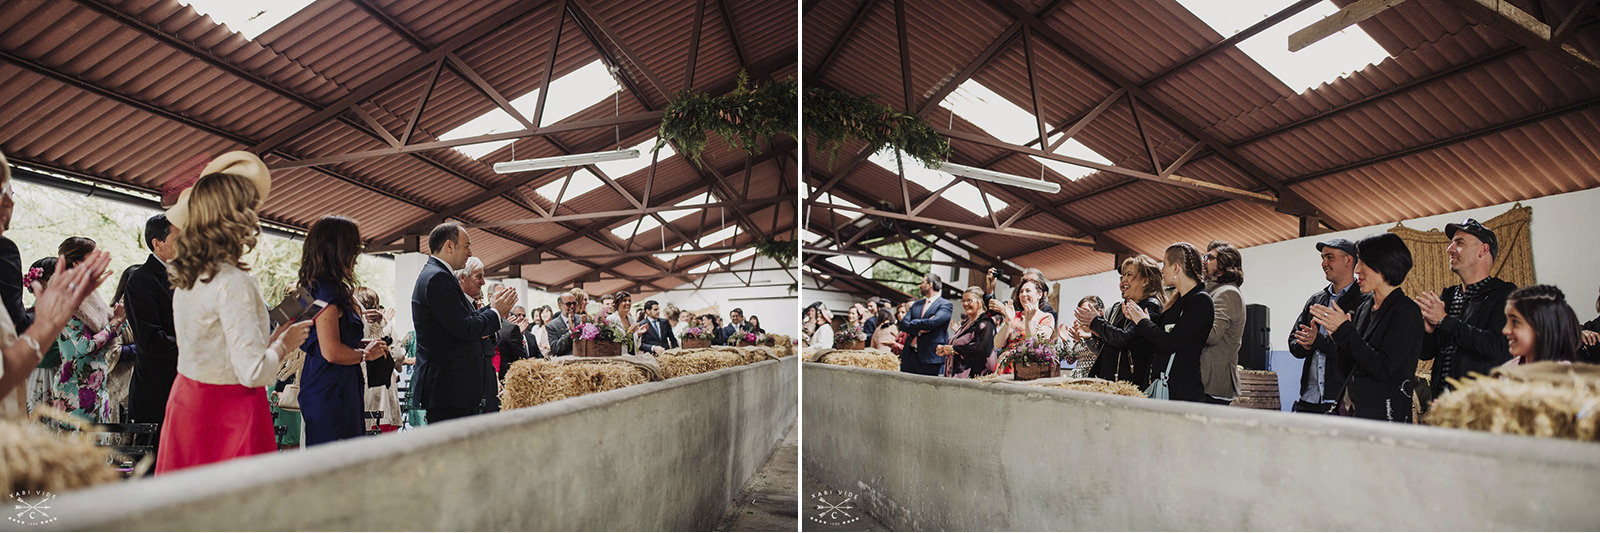 boda en la finca bauskain bodas-92.1